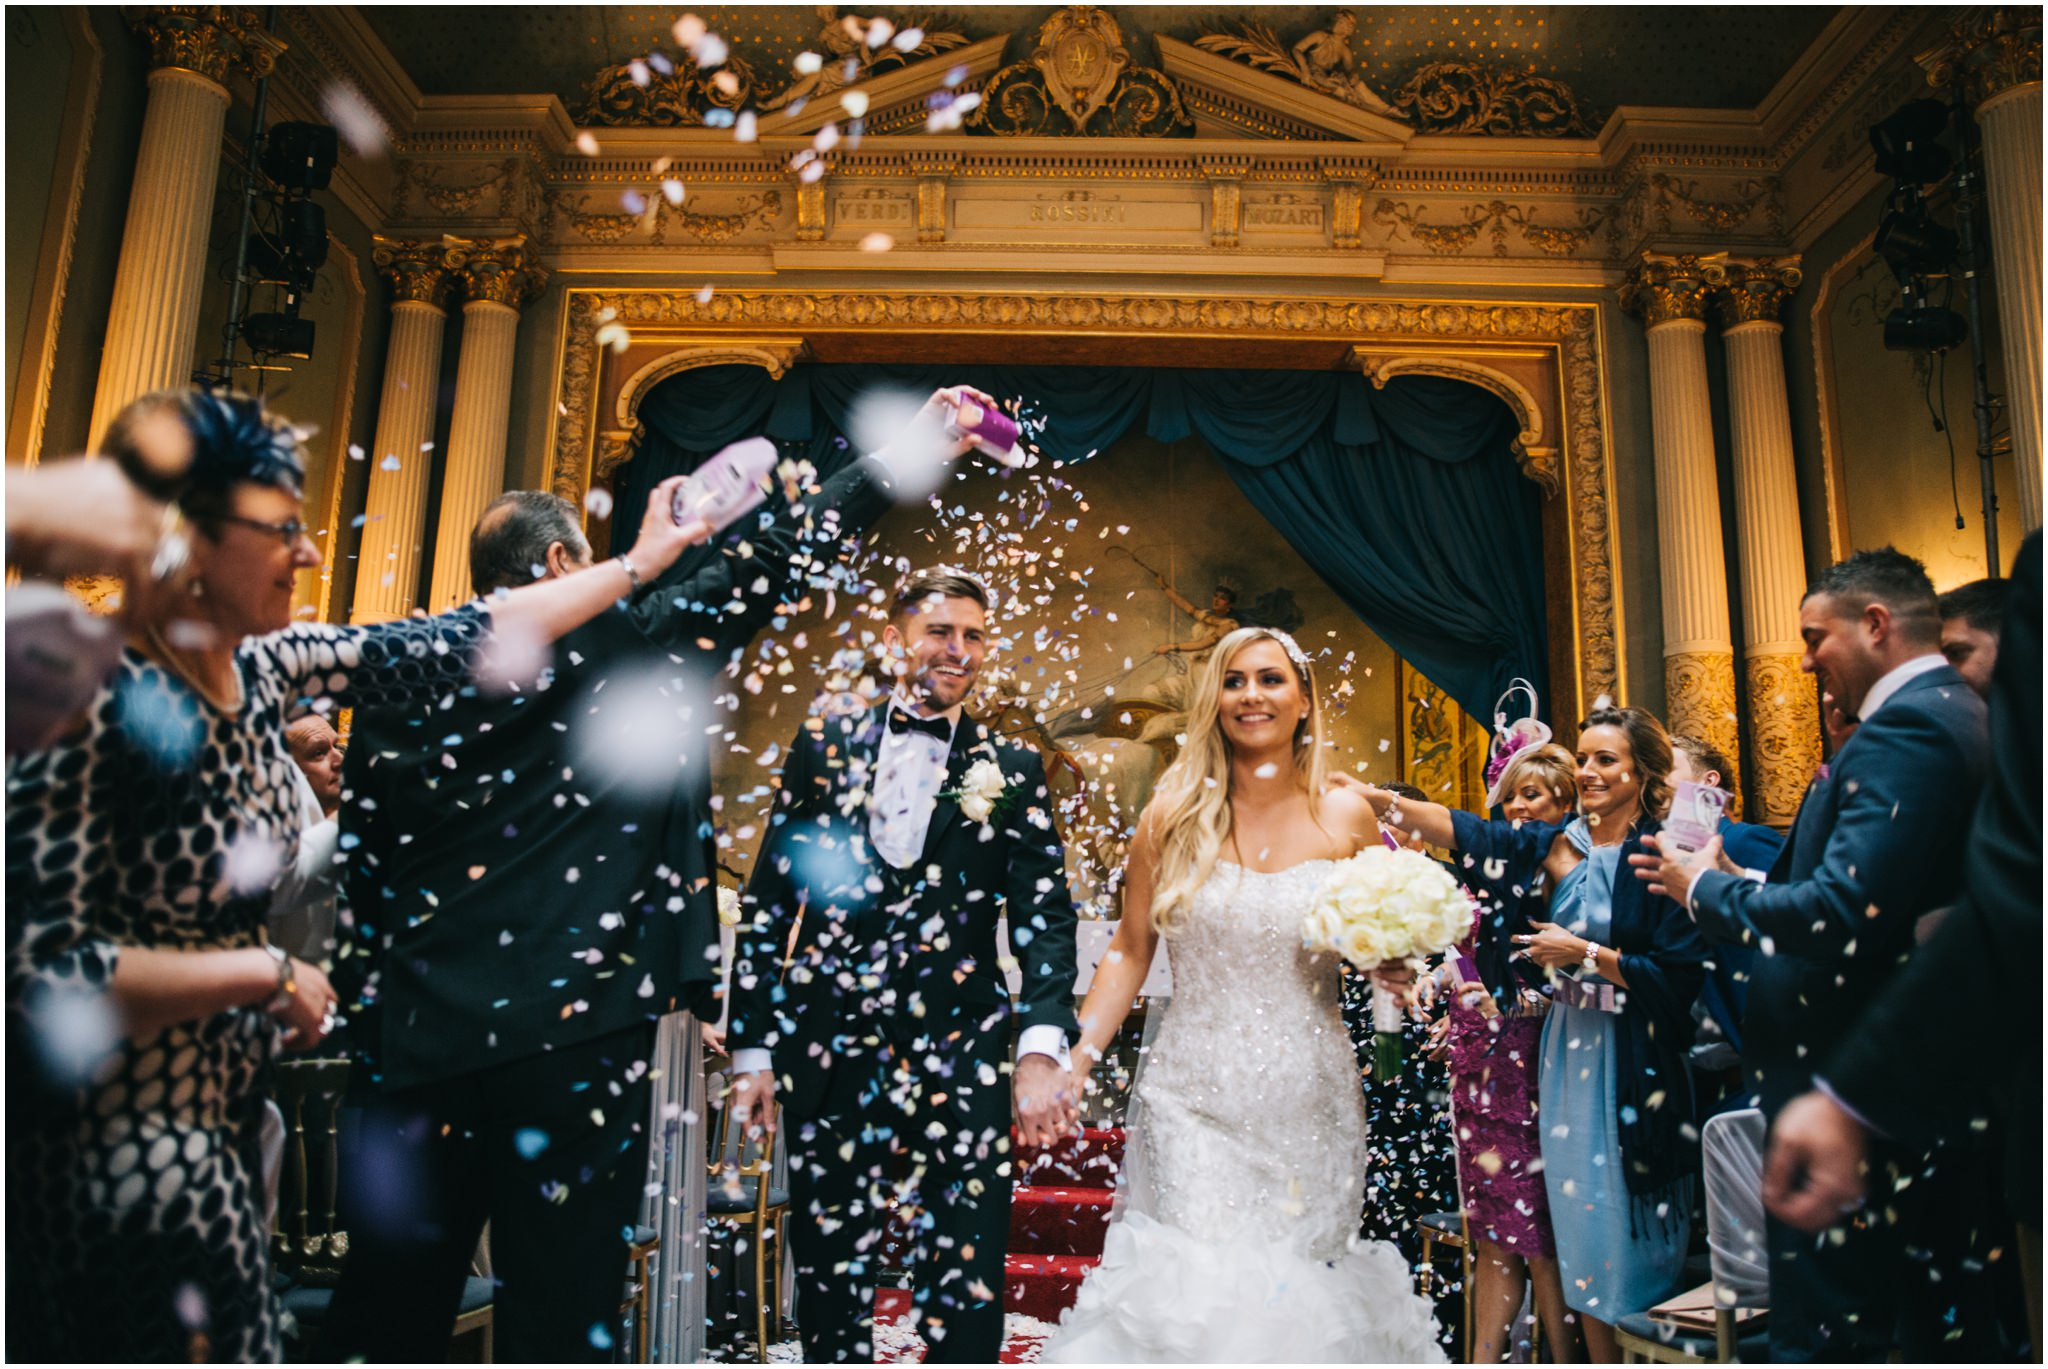 Richard Savage Photography, Wedding, Craig Yr Nos Castle2016-07-03_0059